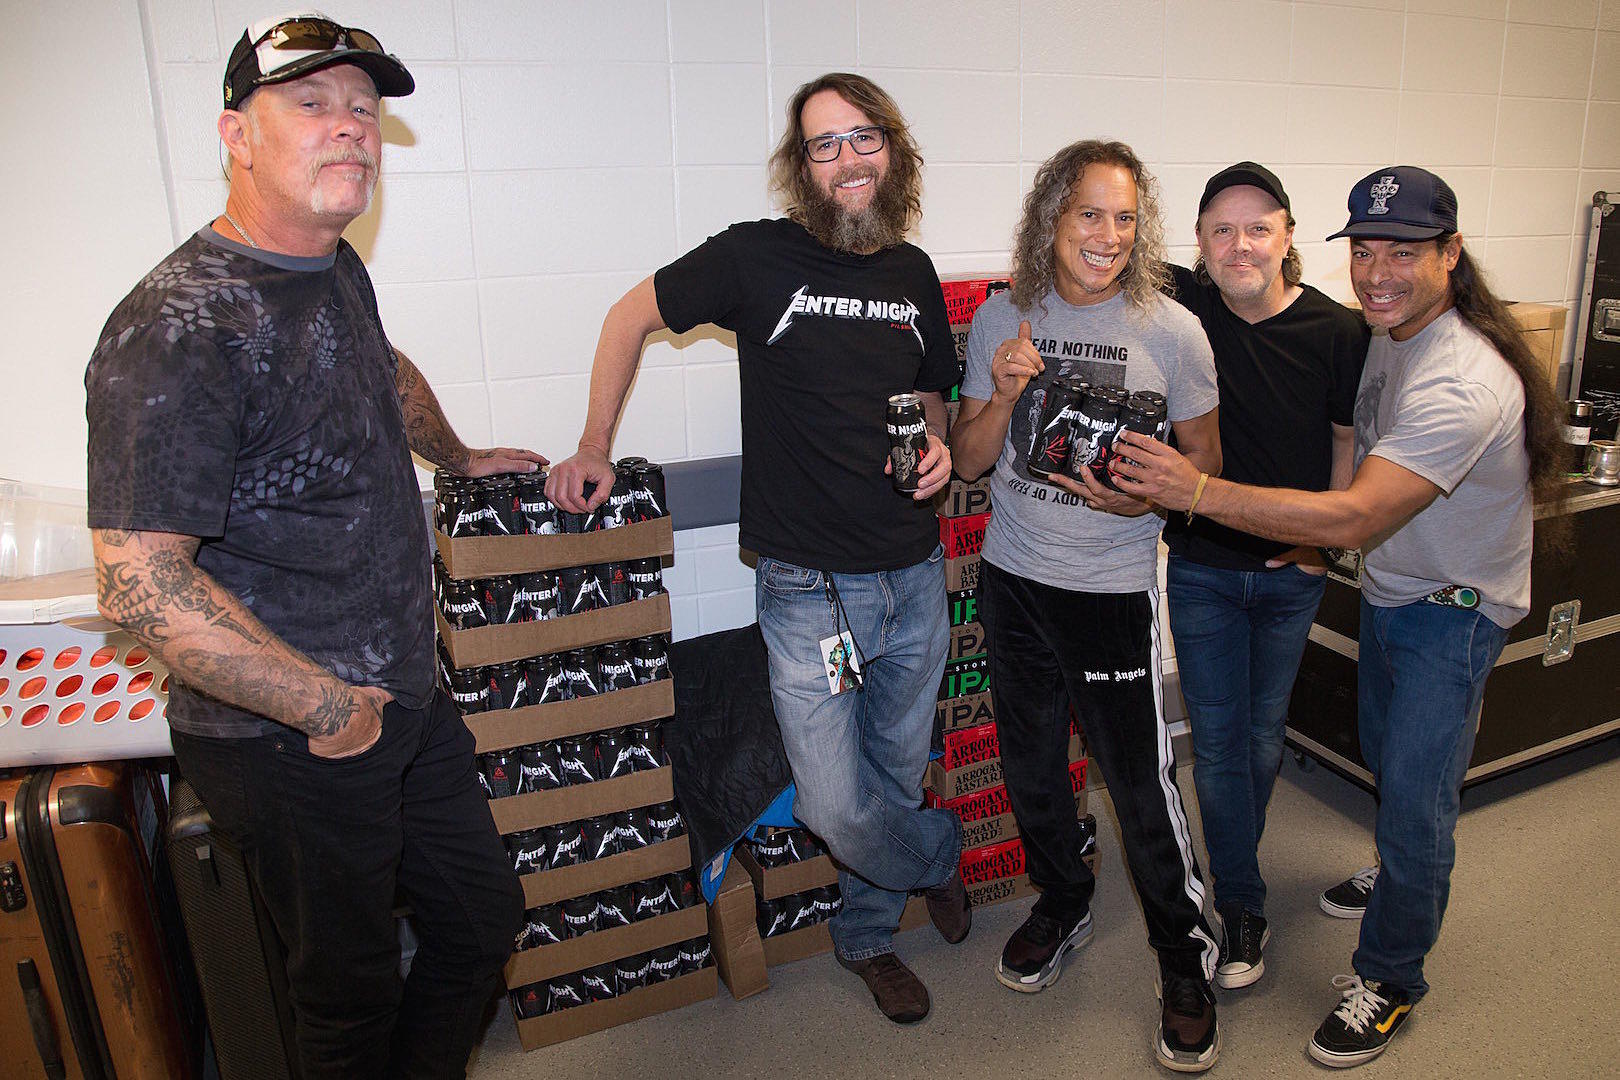 Metallica enter night biere